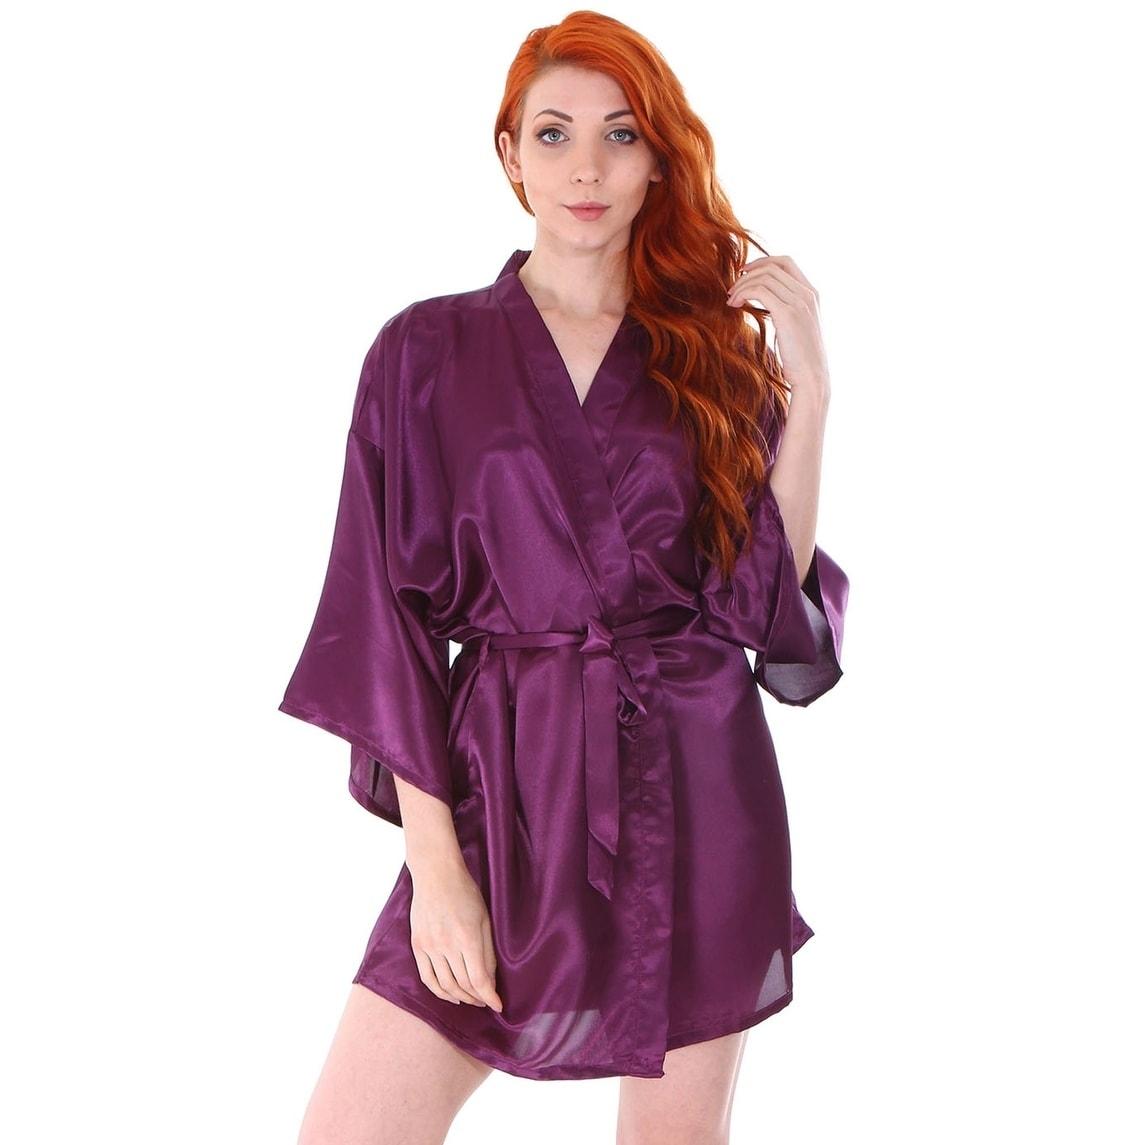 4eede6d82d21 Shop Women s Silk Satin Short Lingerie Bridal Kimono Robe - On Sale ...